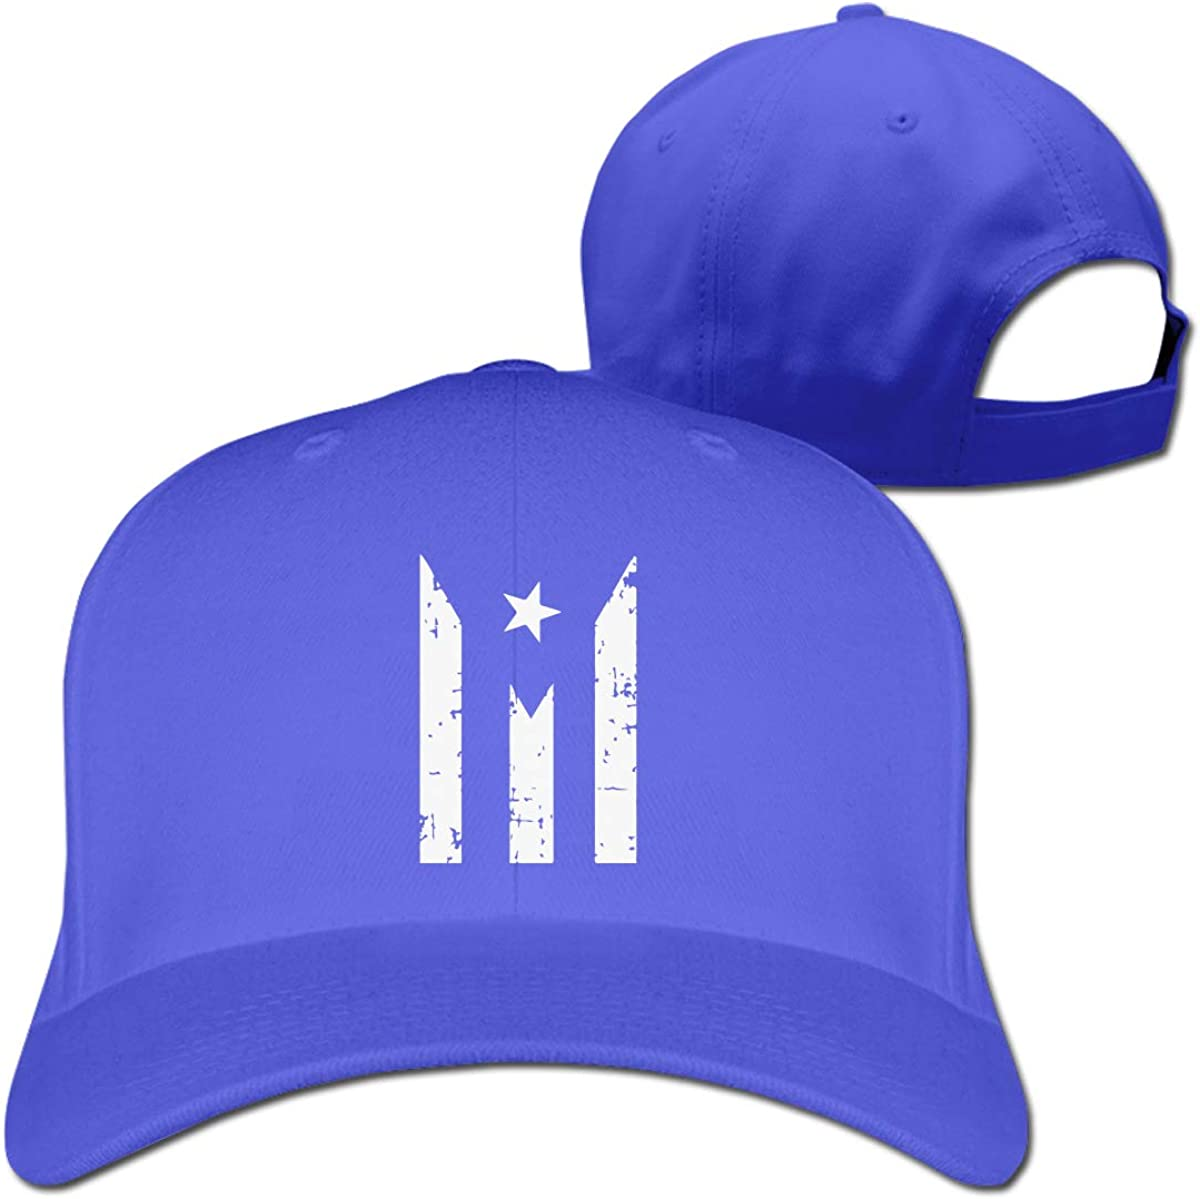 Puerto Rico Resiste Boricua Flag Unisex Pure Color Baseball Cap Classic Adjustable Visor Hat